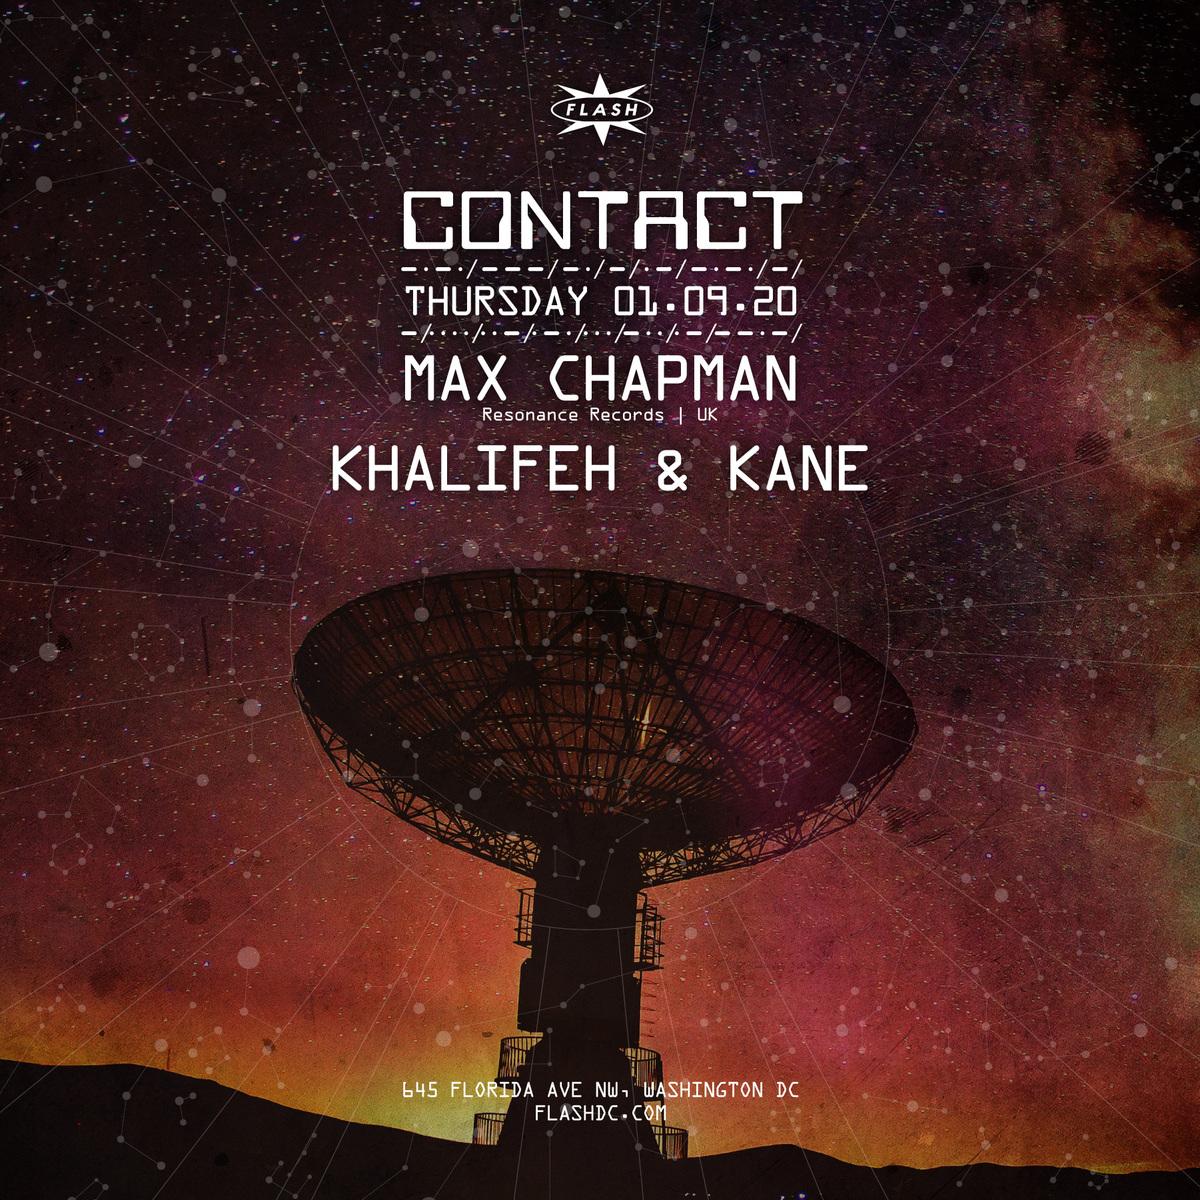 CONTACT: Max Chapman event thumbnail